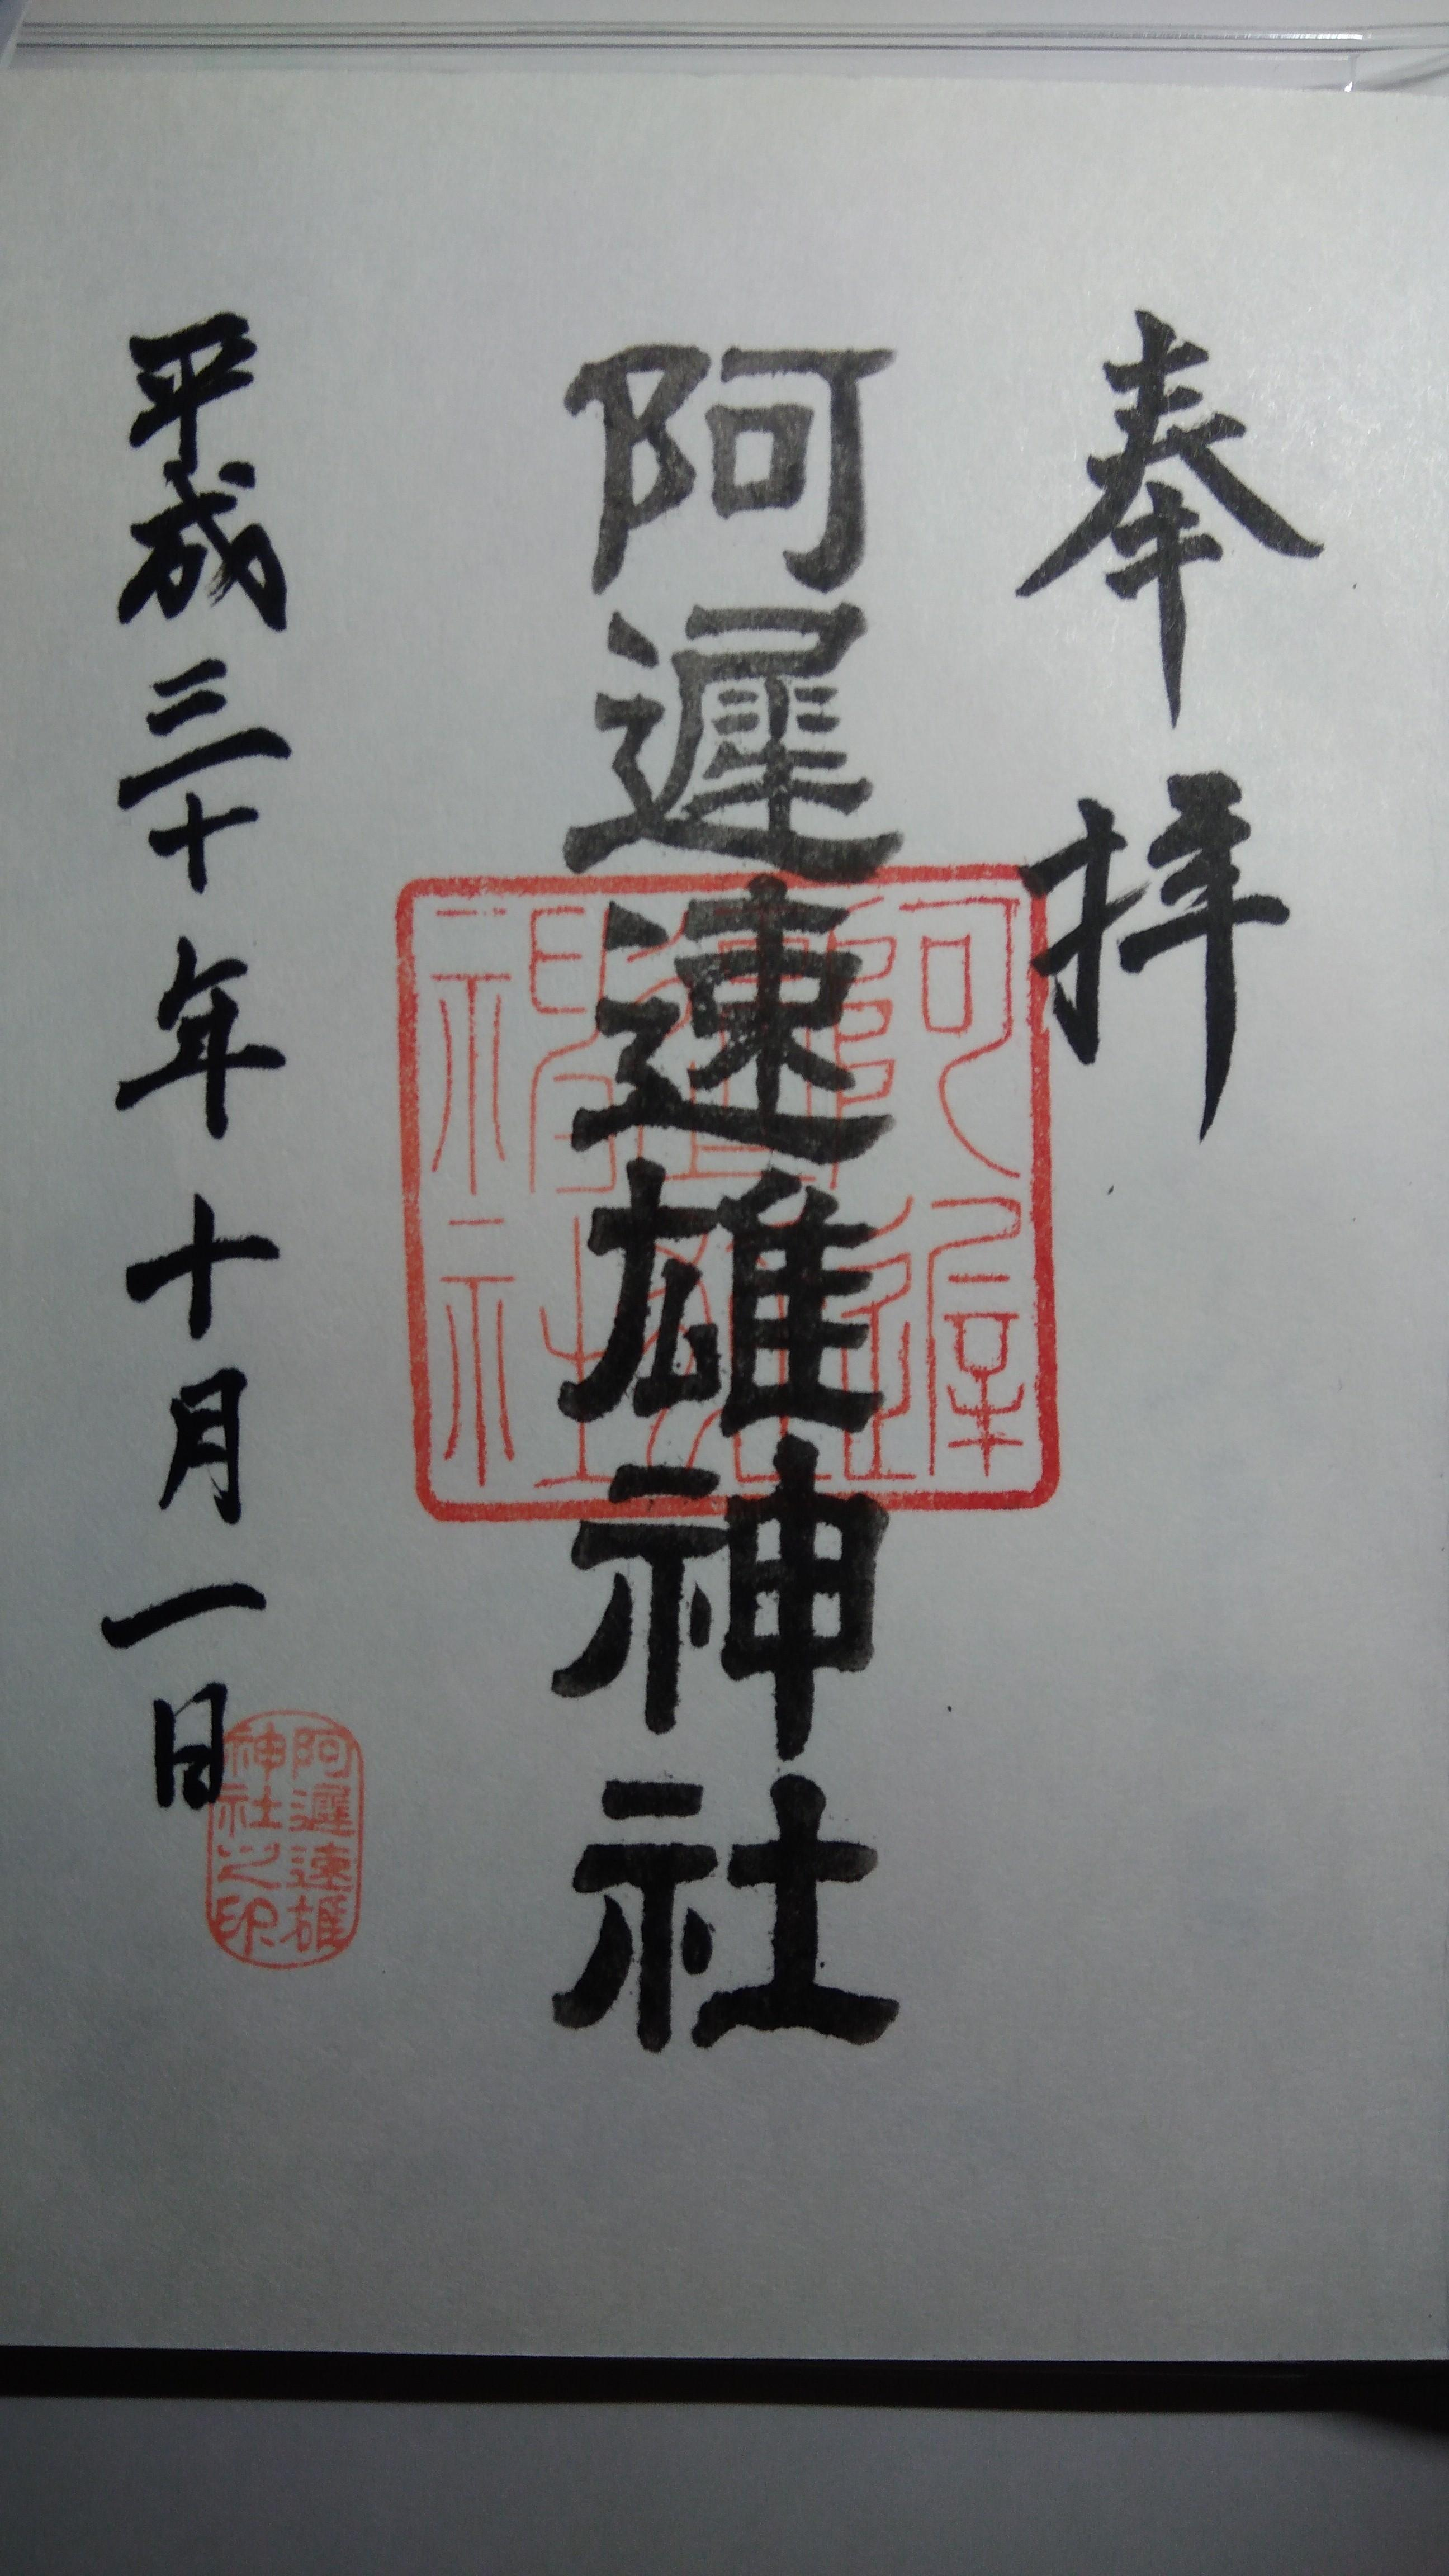 阿遅速雄神社の御朱印